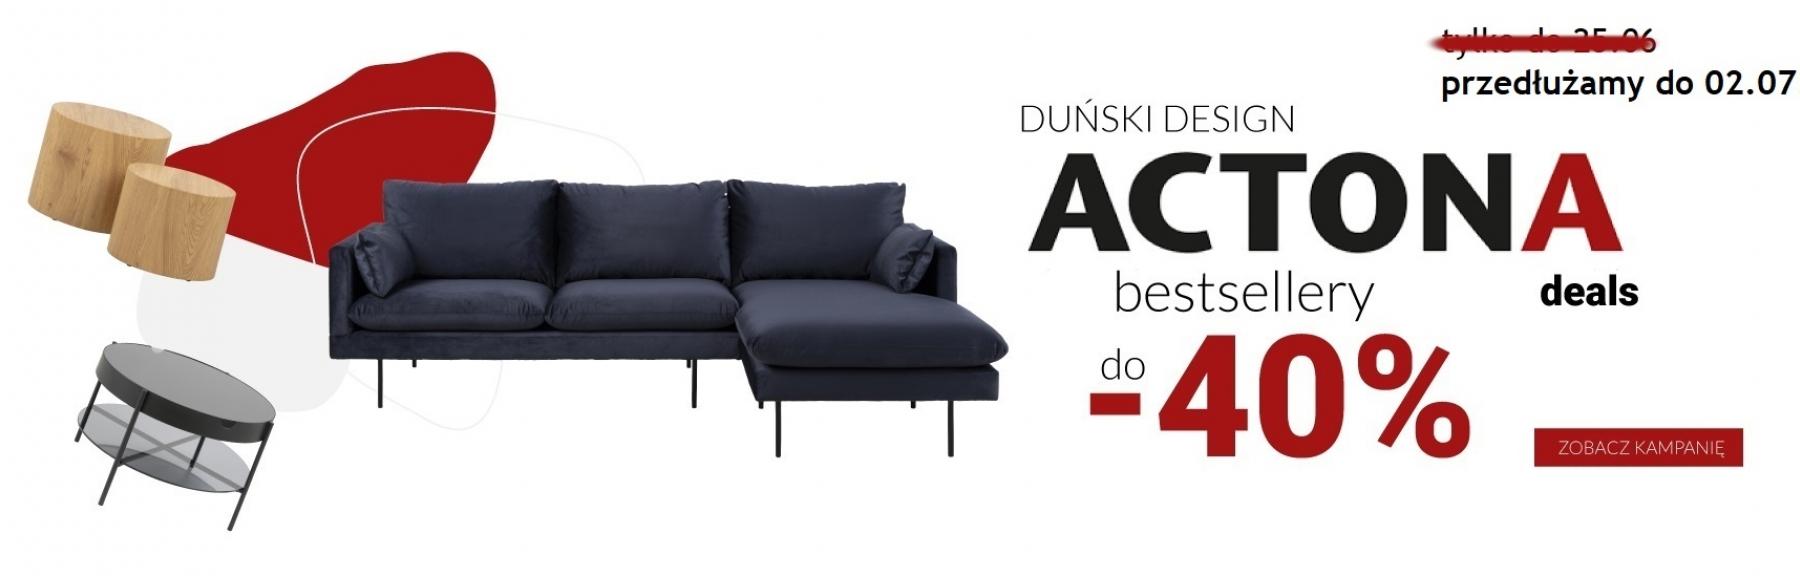 Lectus: do 40% zniżki na meble duńskie marki Actona